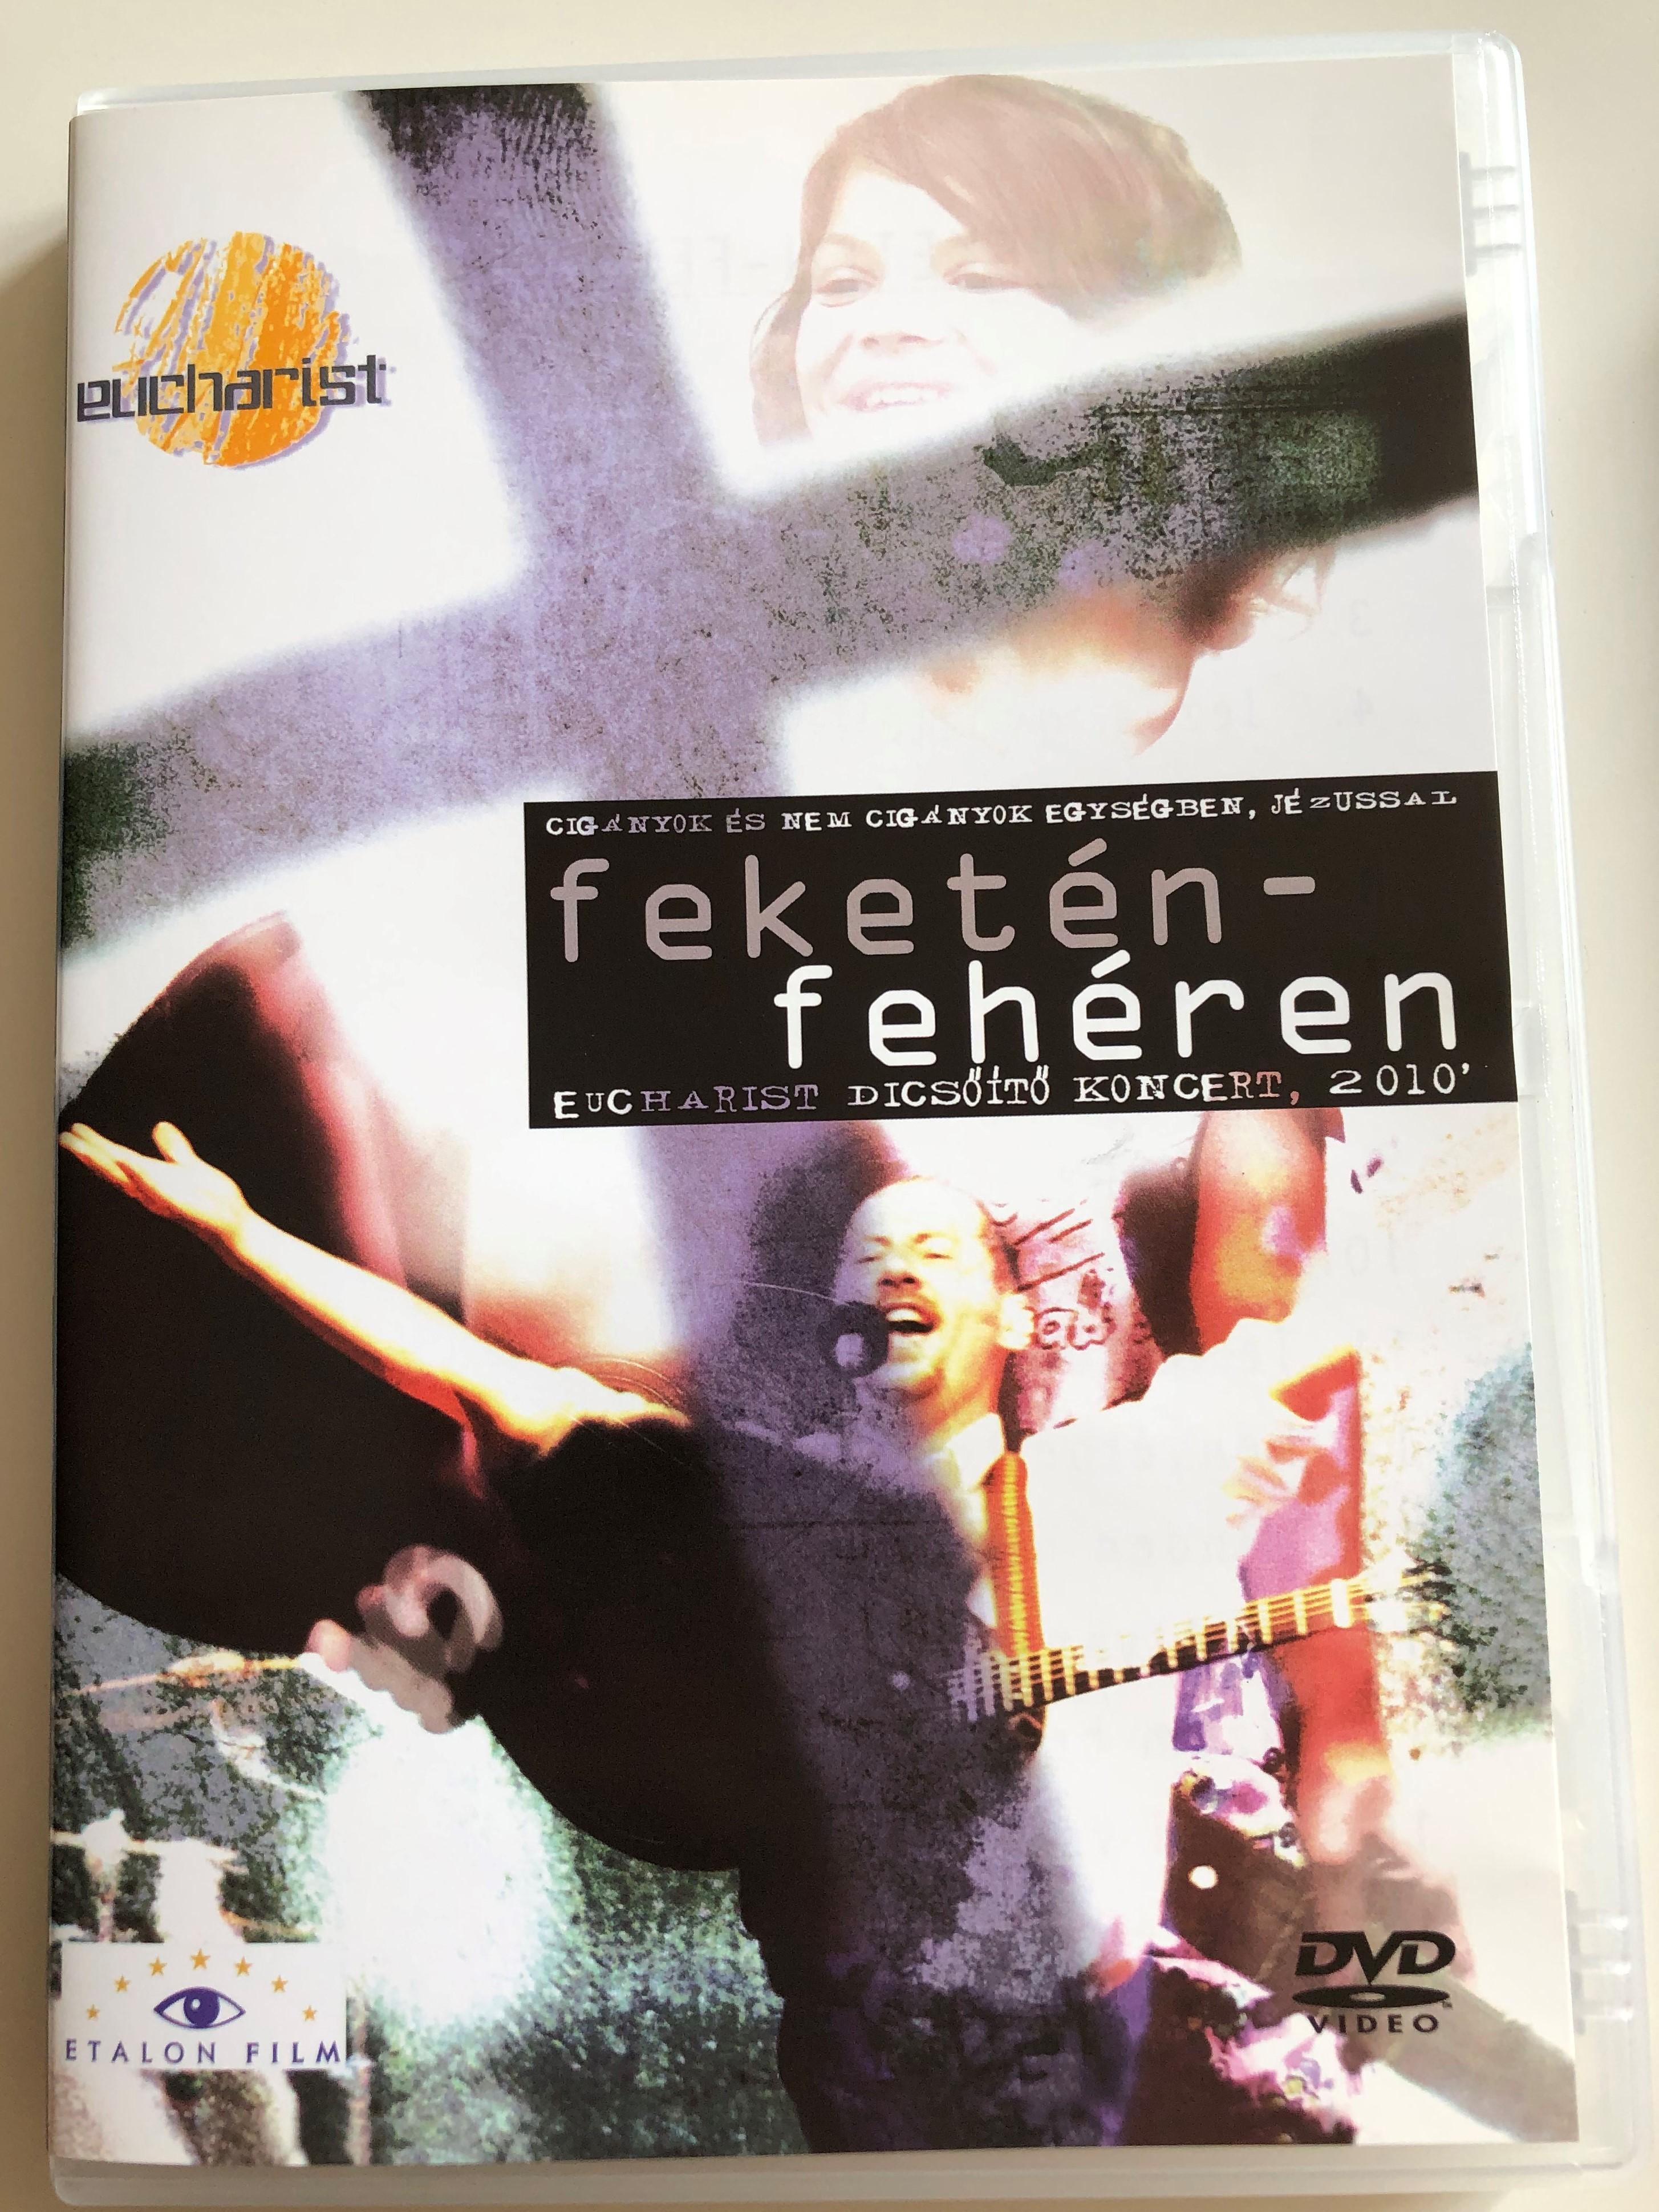 feket-n-feh-ren-dvd-2010-cig-nyok-s-nem-cig-nyok-egys-gben-j-zussal-eucharist-dics-t-koncert-2010-etalon-film-hungarian-praise-and-worship-concert-dvd-1-.jpg